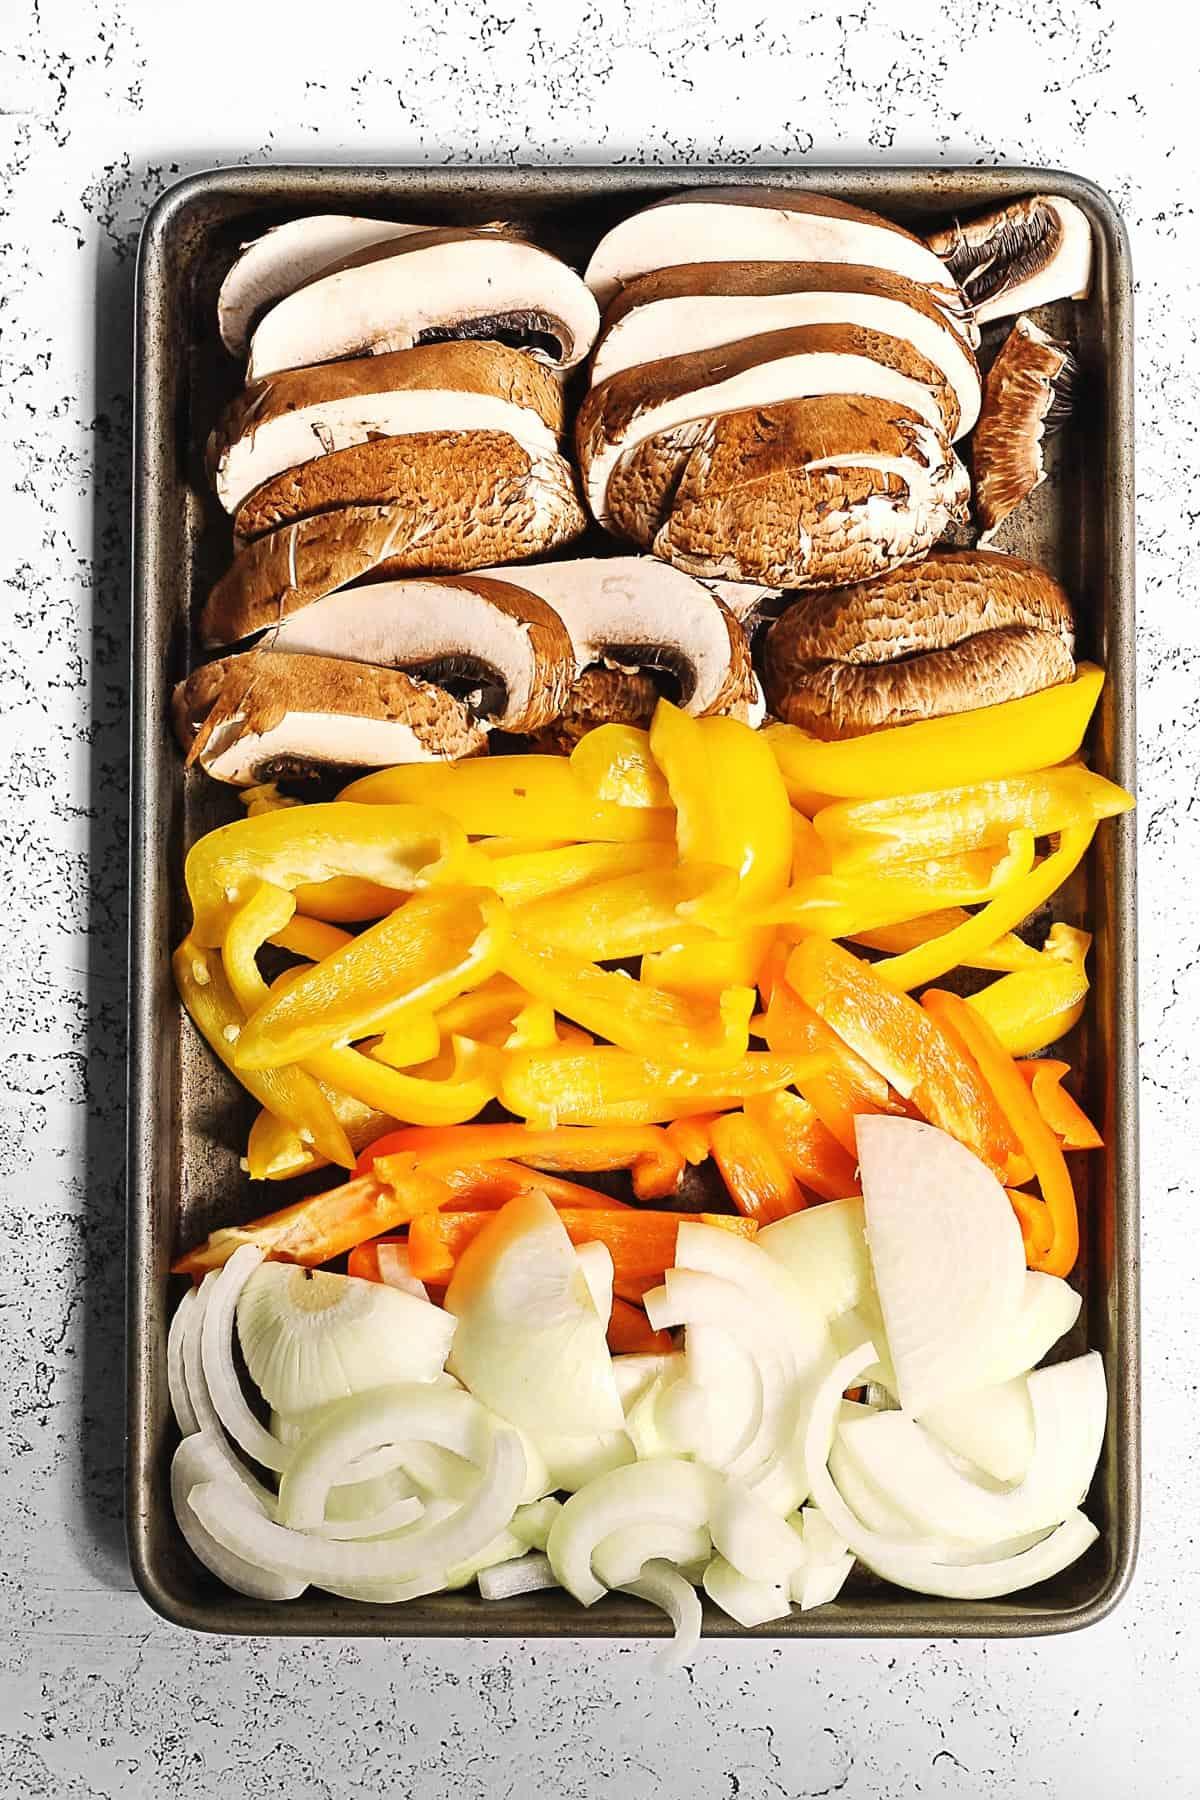 Fajita veggies on a sheet pan